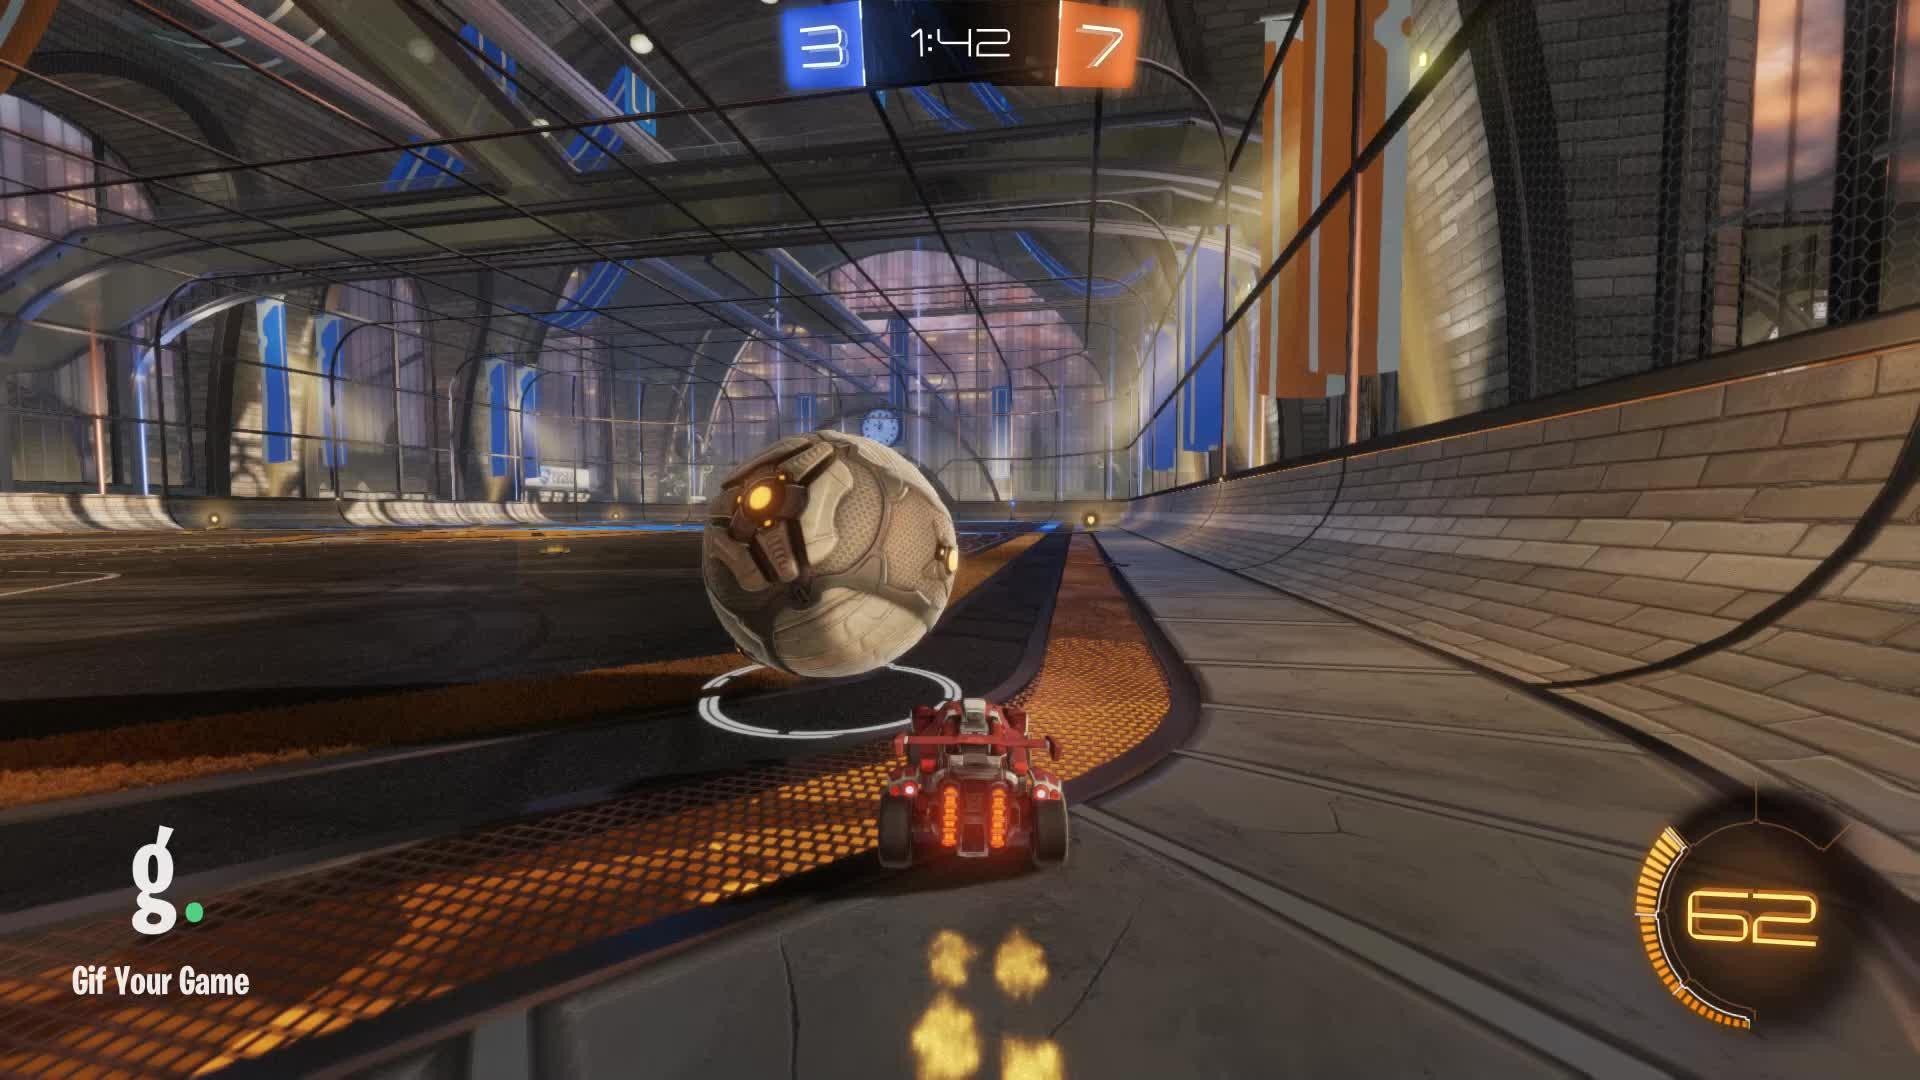 Gif Your Game, GifYourGame, Goal, Goldfish, Rocket League, RocketLeague, Goal 11: Goldfish GIFs